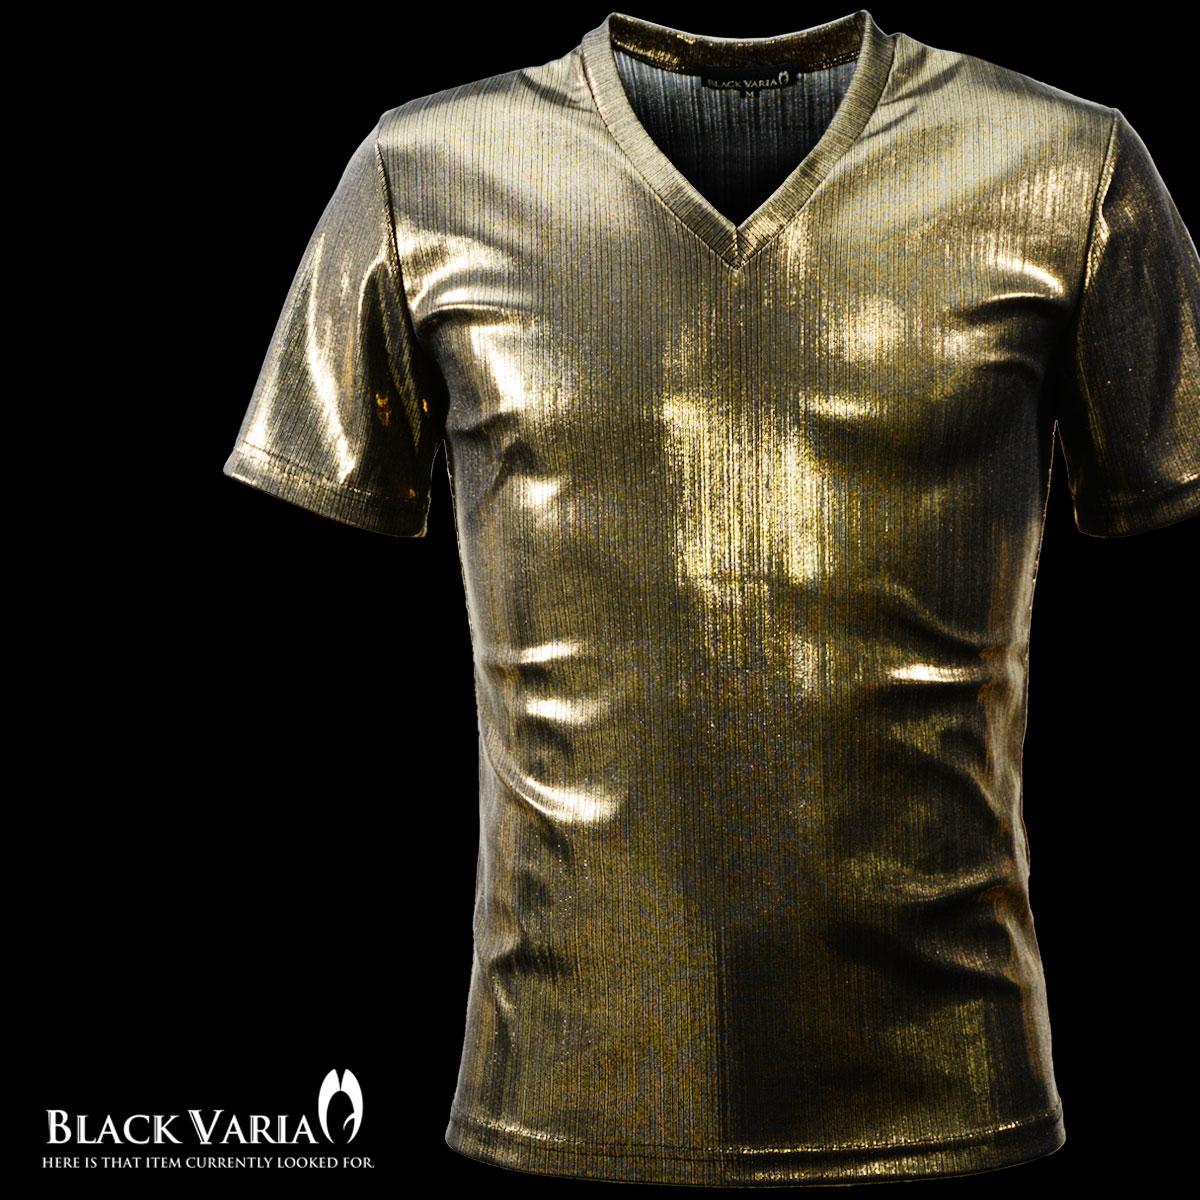 Tシャツ ラメ ストライプ Vネック 半袖 メンズ 日本製 細身 無地 光沢 箔プリント 半袖Tシャツ(ゴールド金)